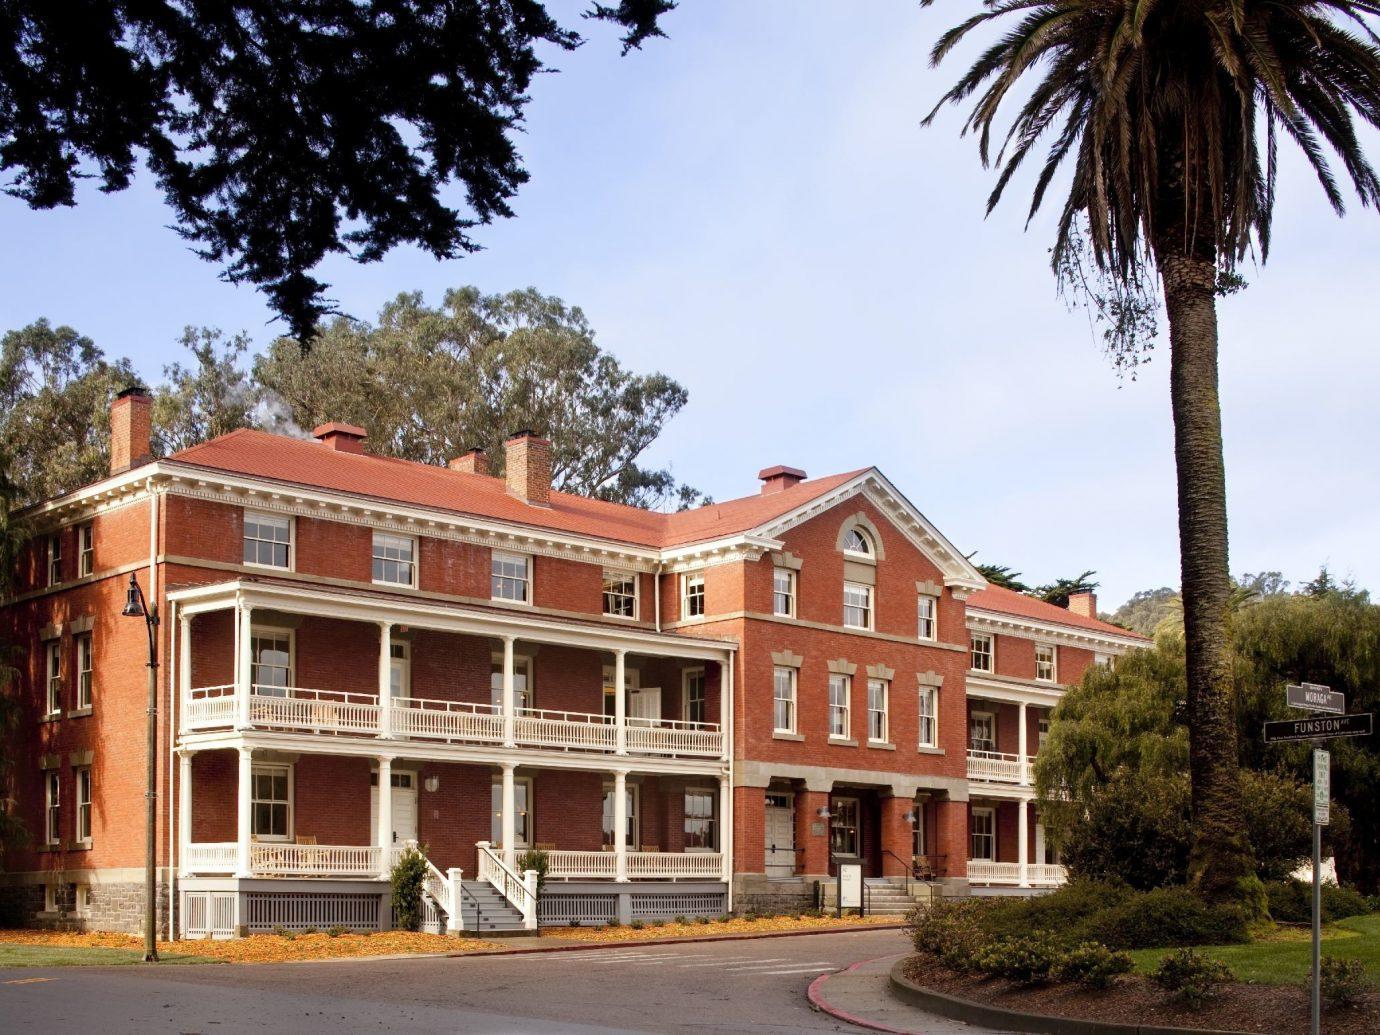 Inn at the Presidio, San Francisco